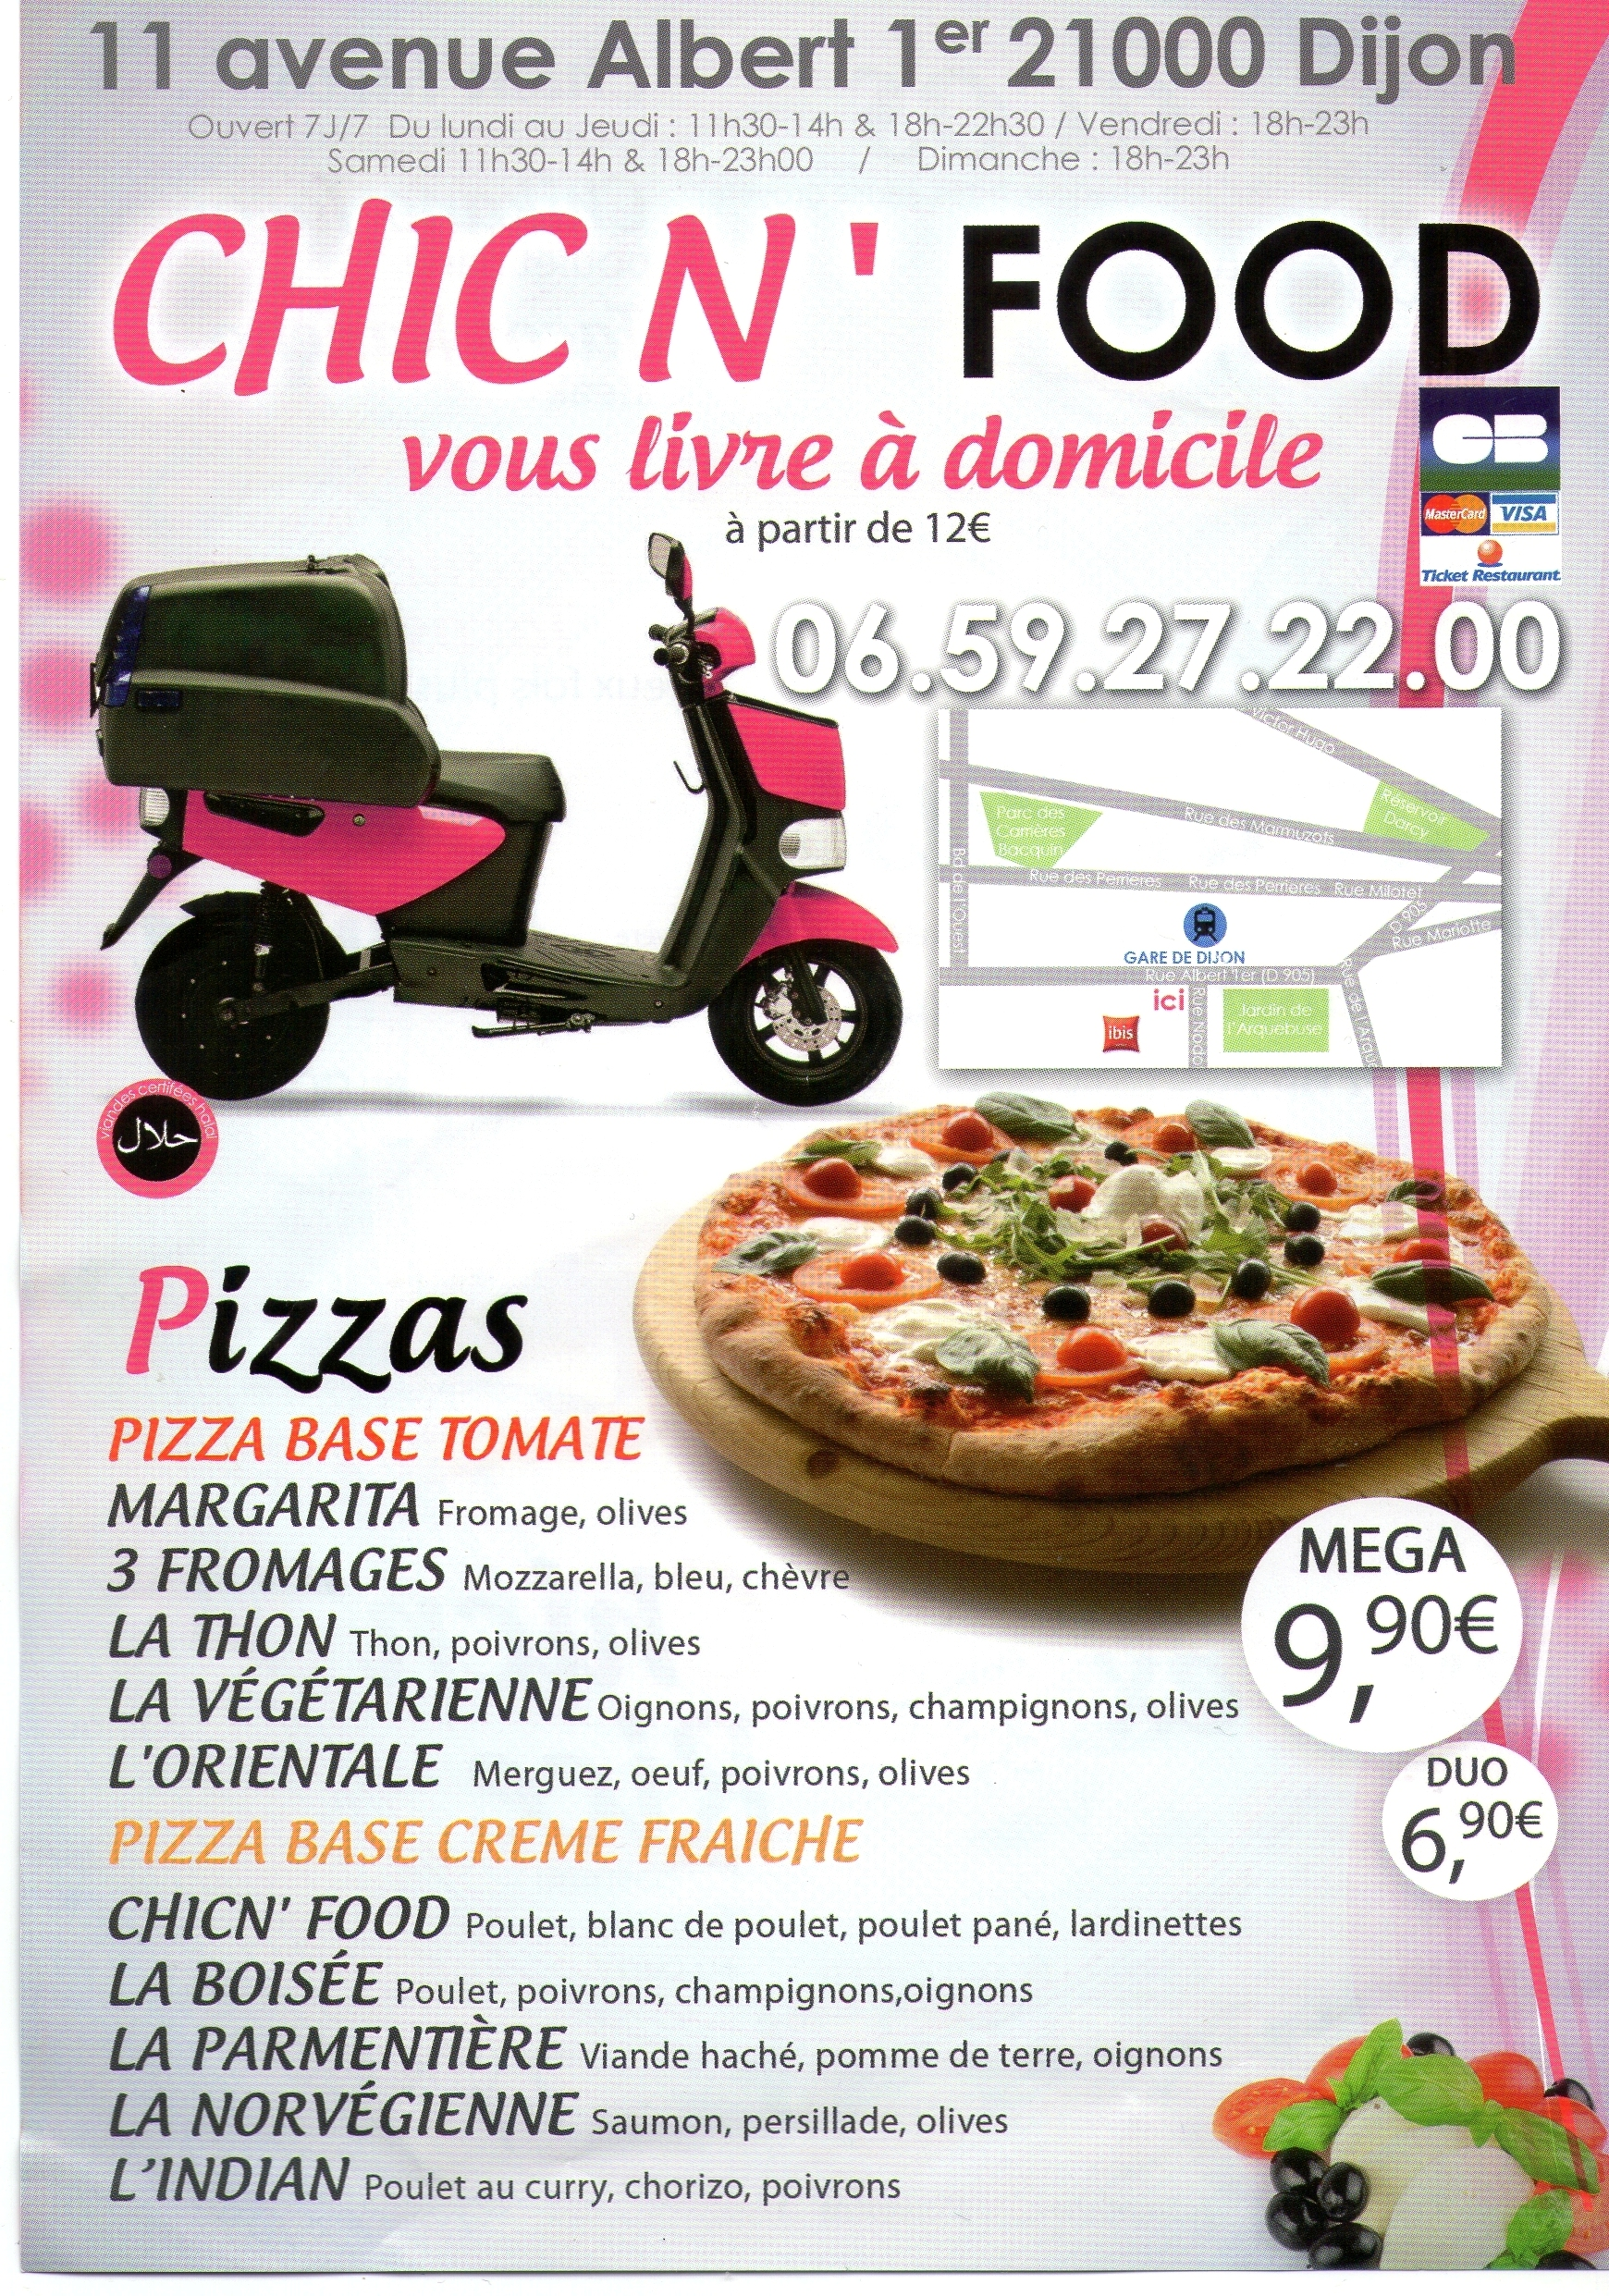 Chic' N Food - Dijon